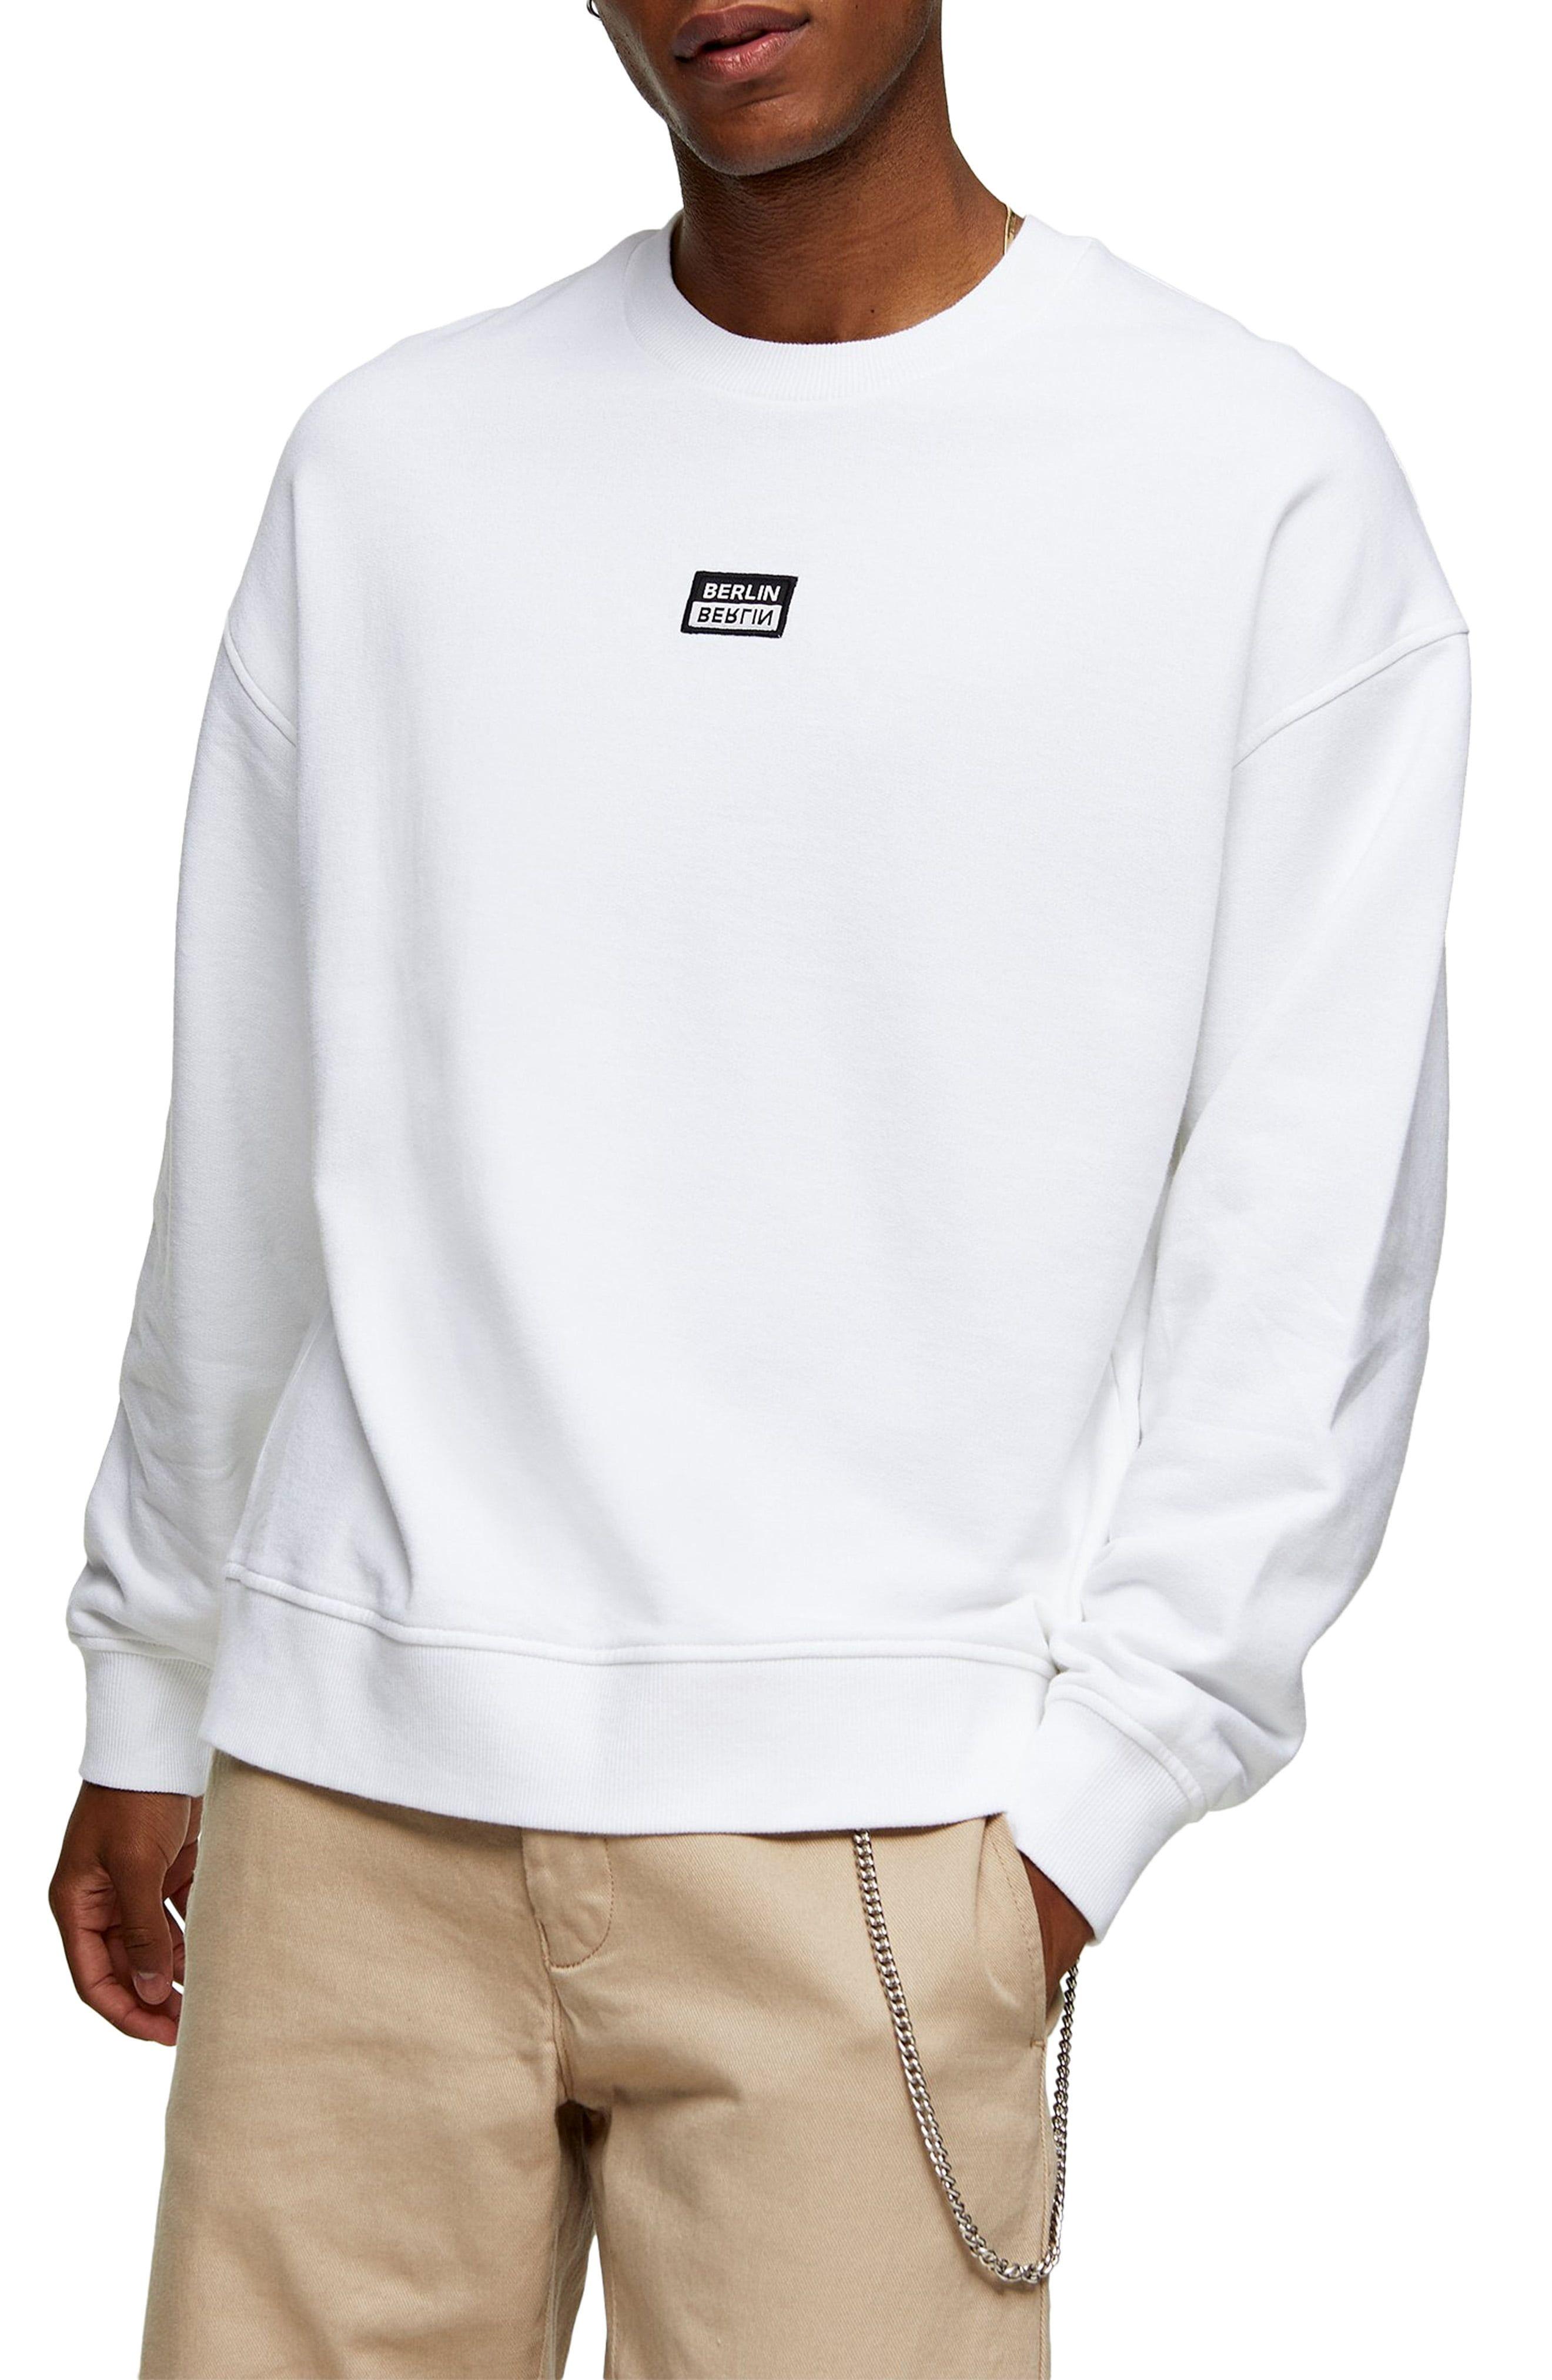 Topman Berlin Patch Oversize Crewneck Sweatshirt Nordstrom Crew Neck Sweatshirt Sweatshirts Oversized Crewneck [ 4048 x 2640 Pixel ]